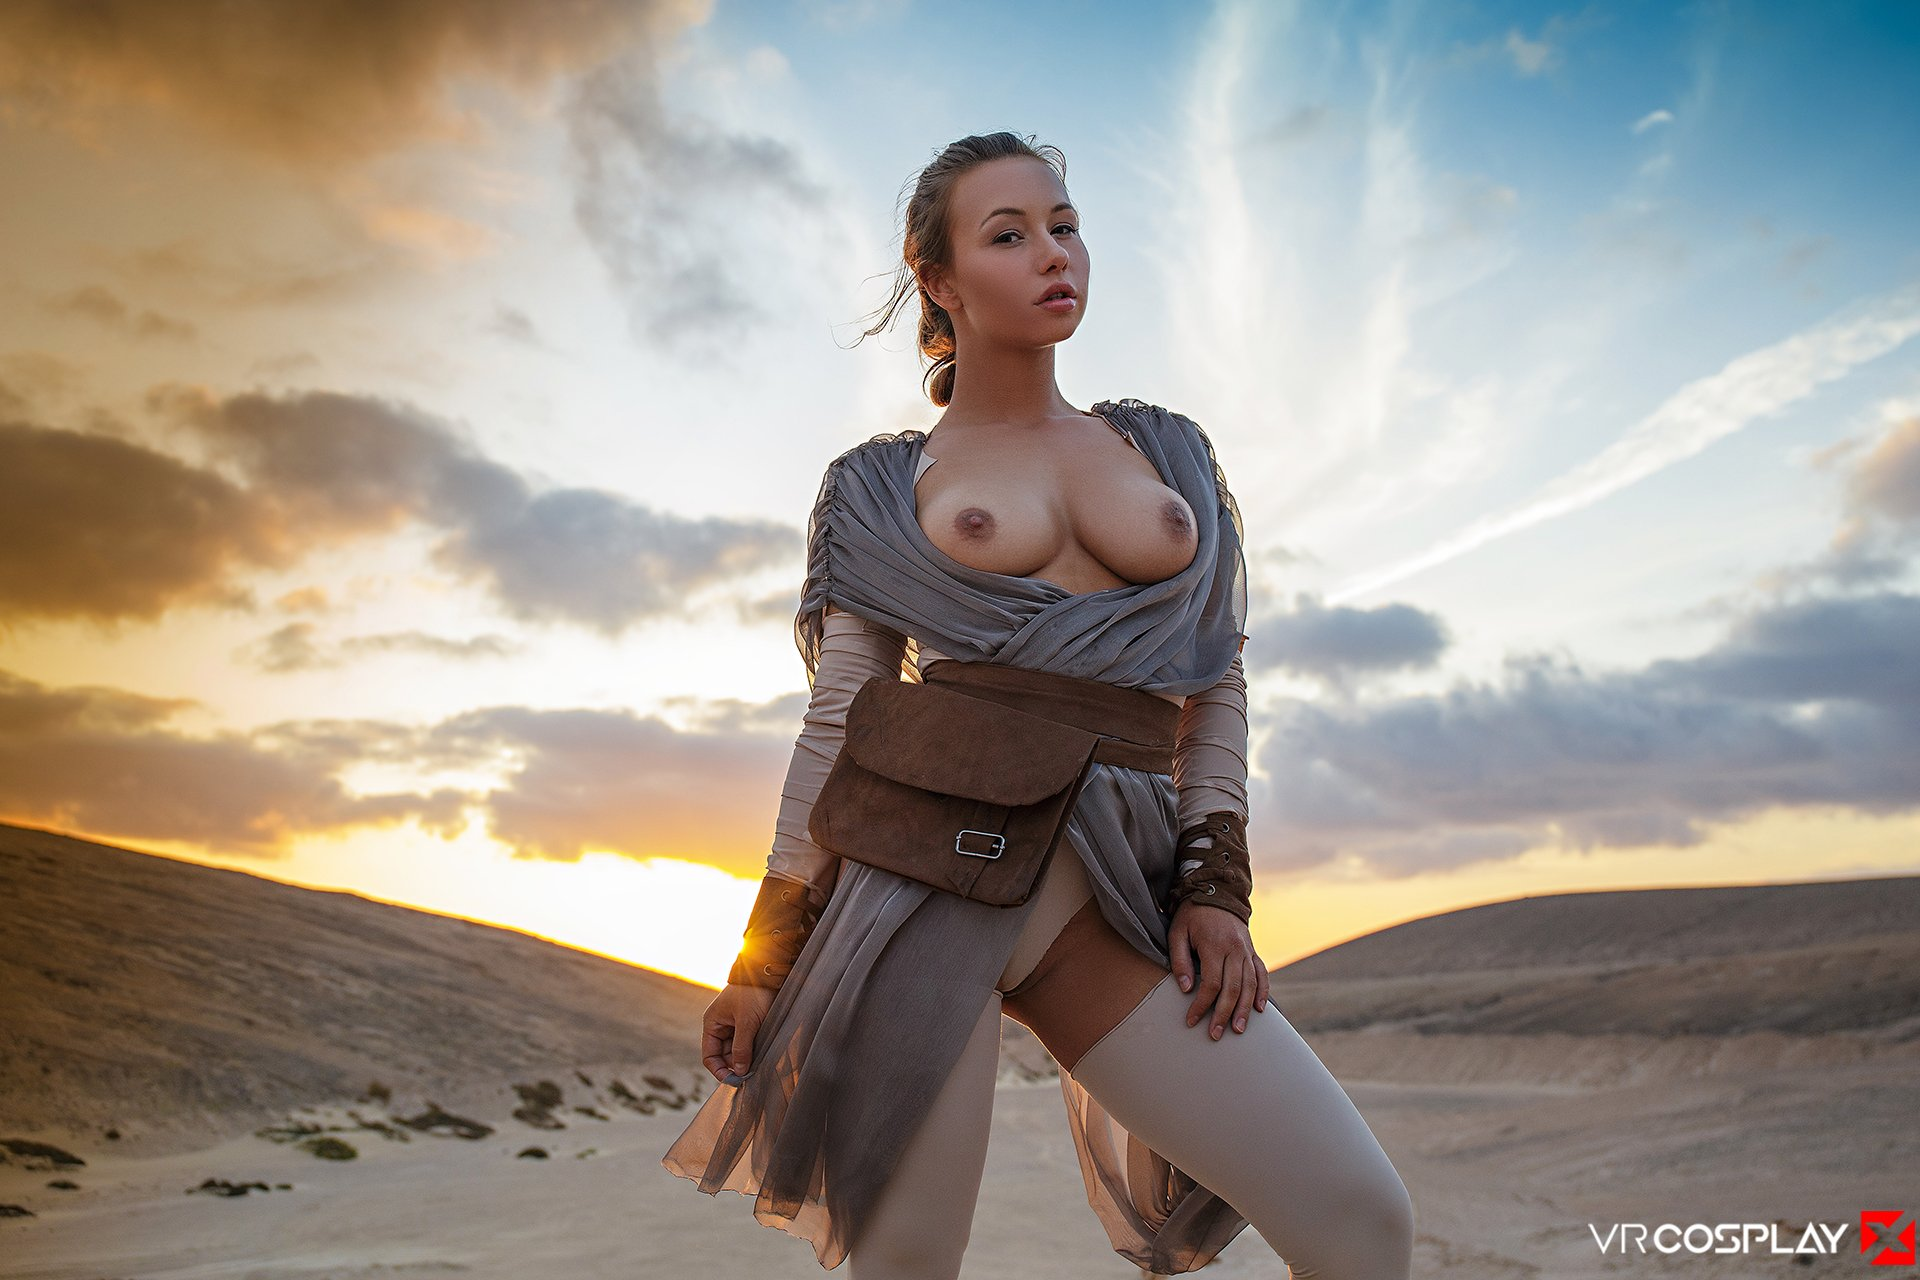 Star wars cosplay porn